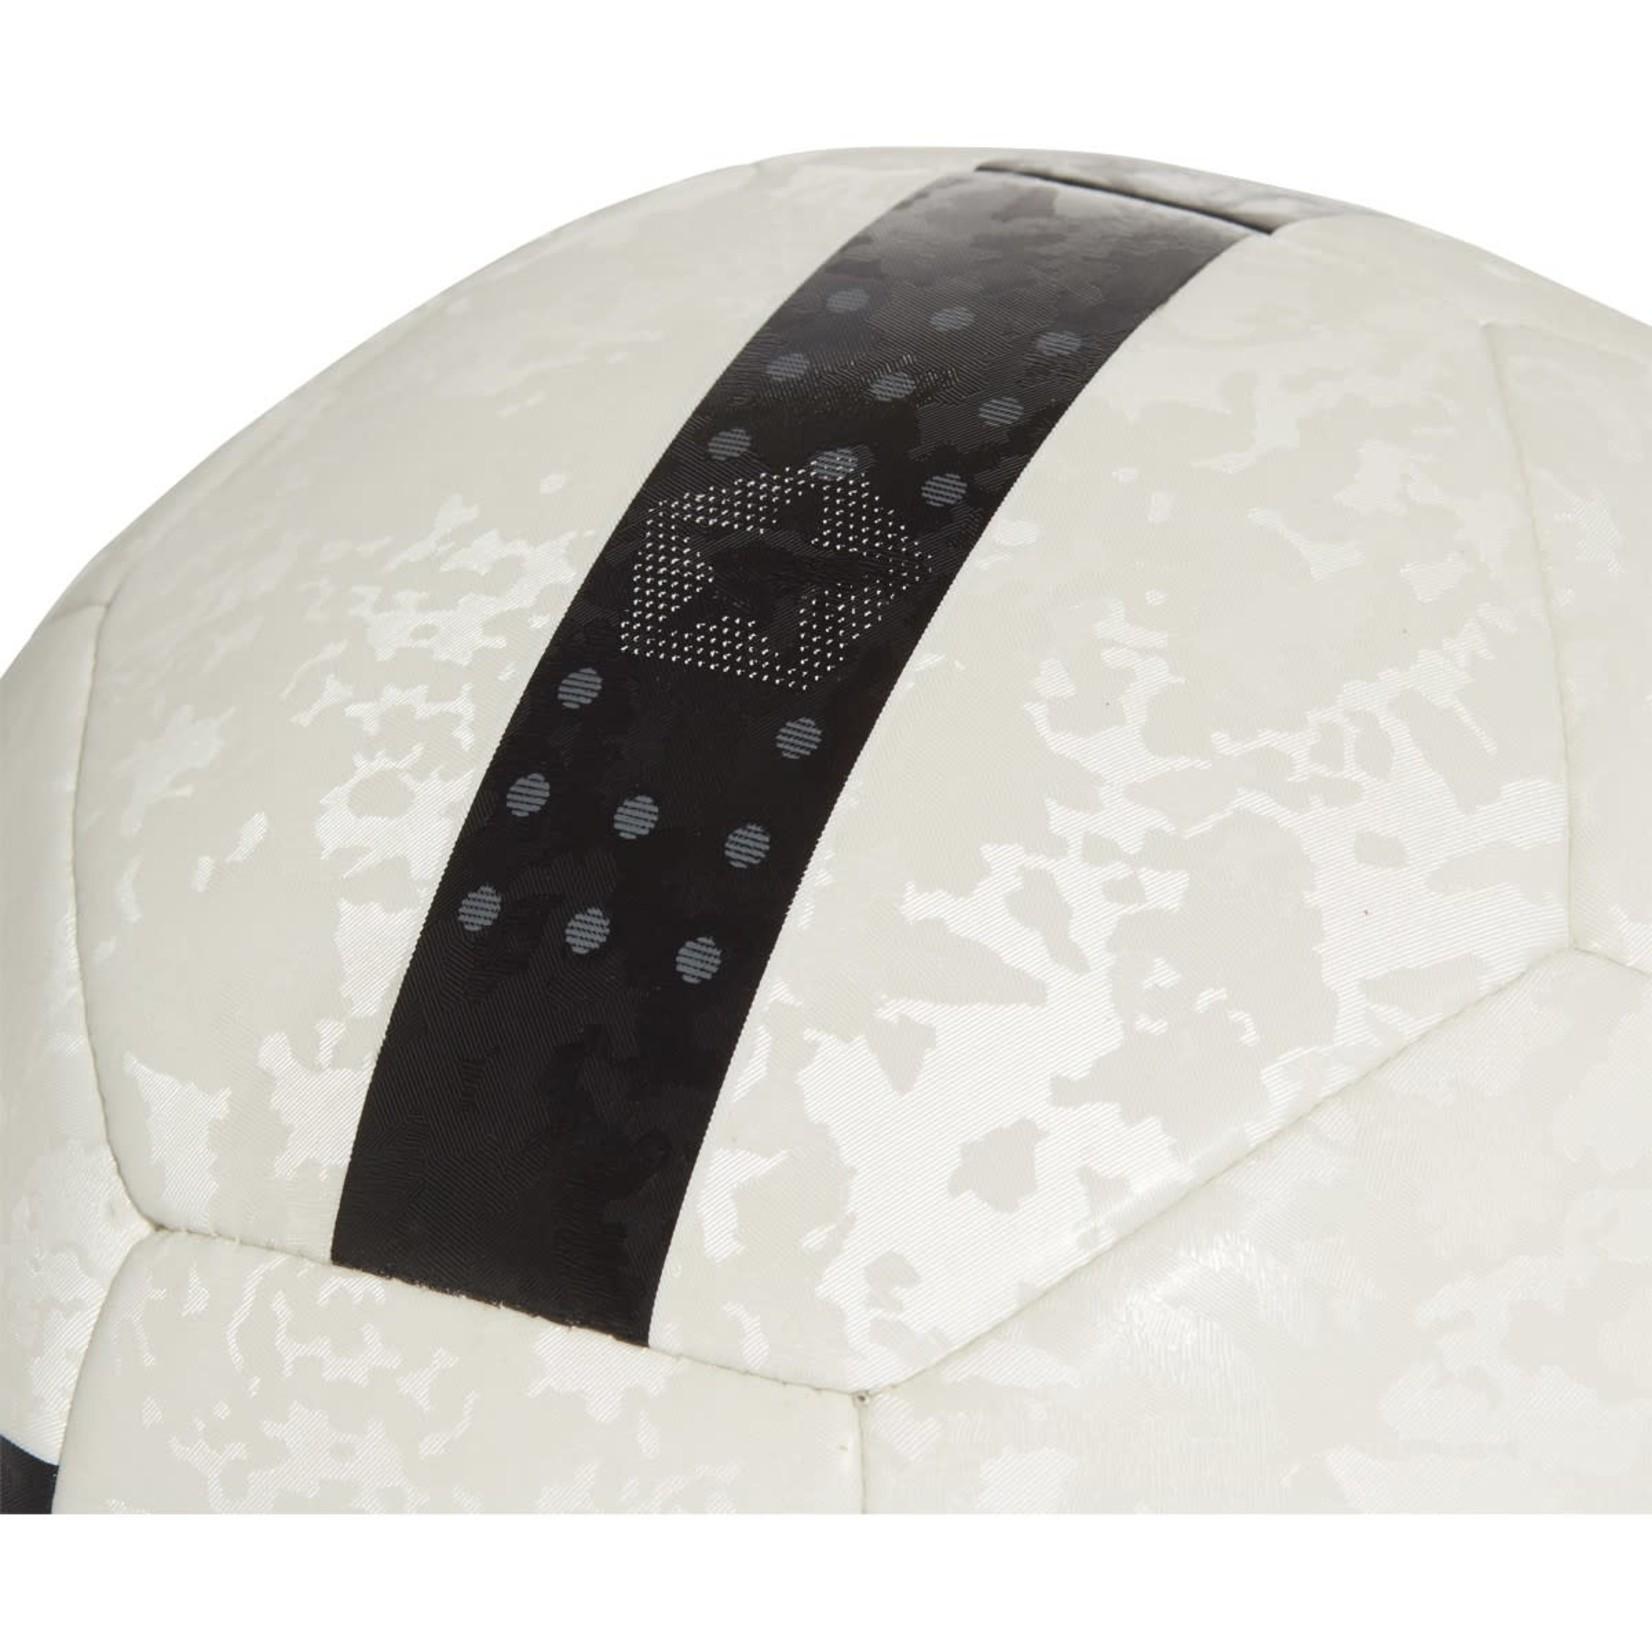 ADIDAS JUVENTUS 21/22 HOME CLUB BALL (WHITE/BLACK)